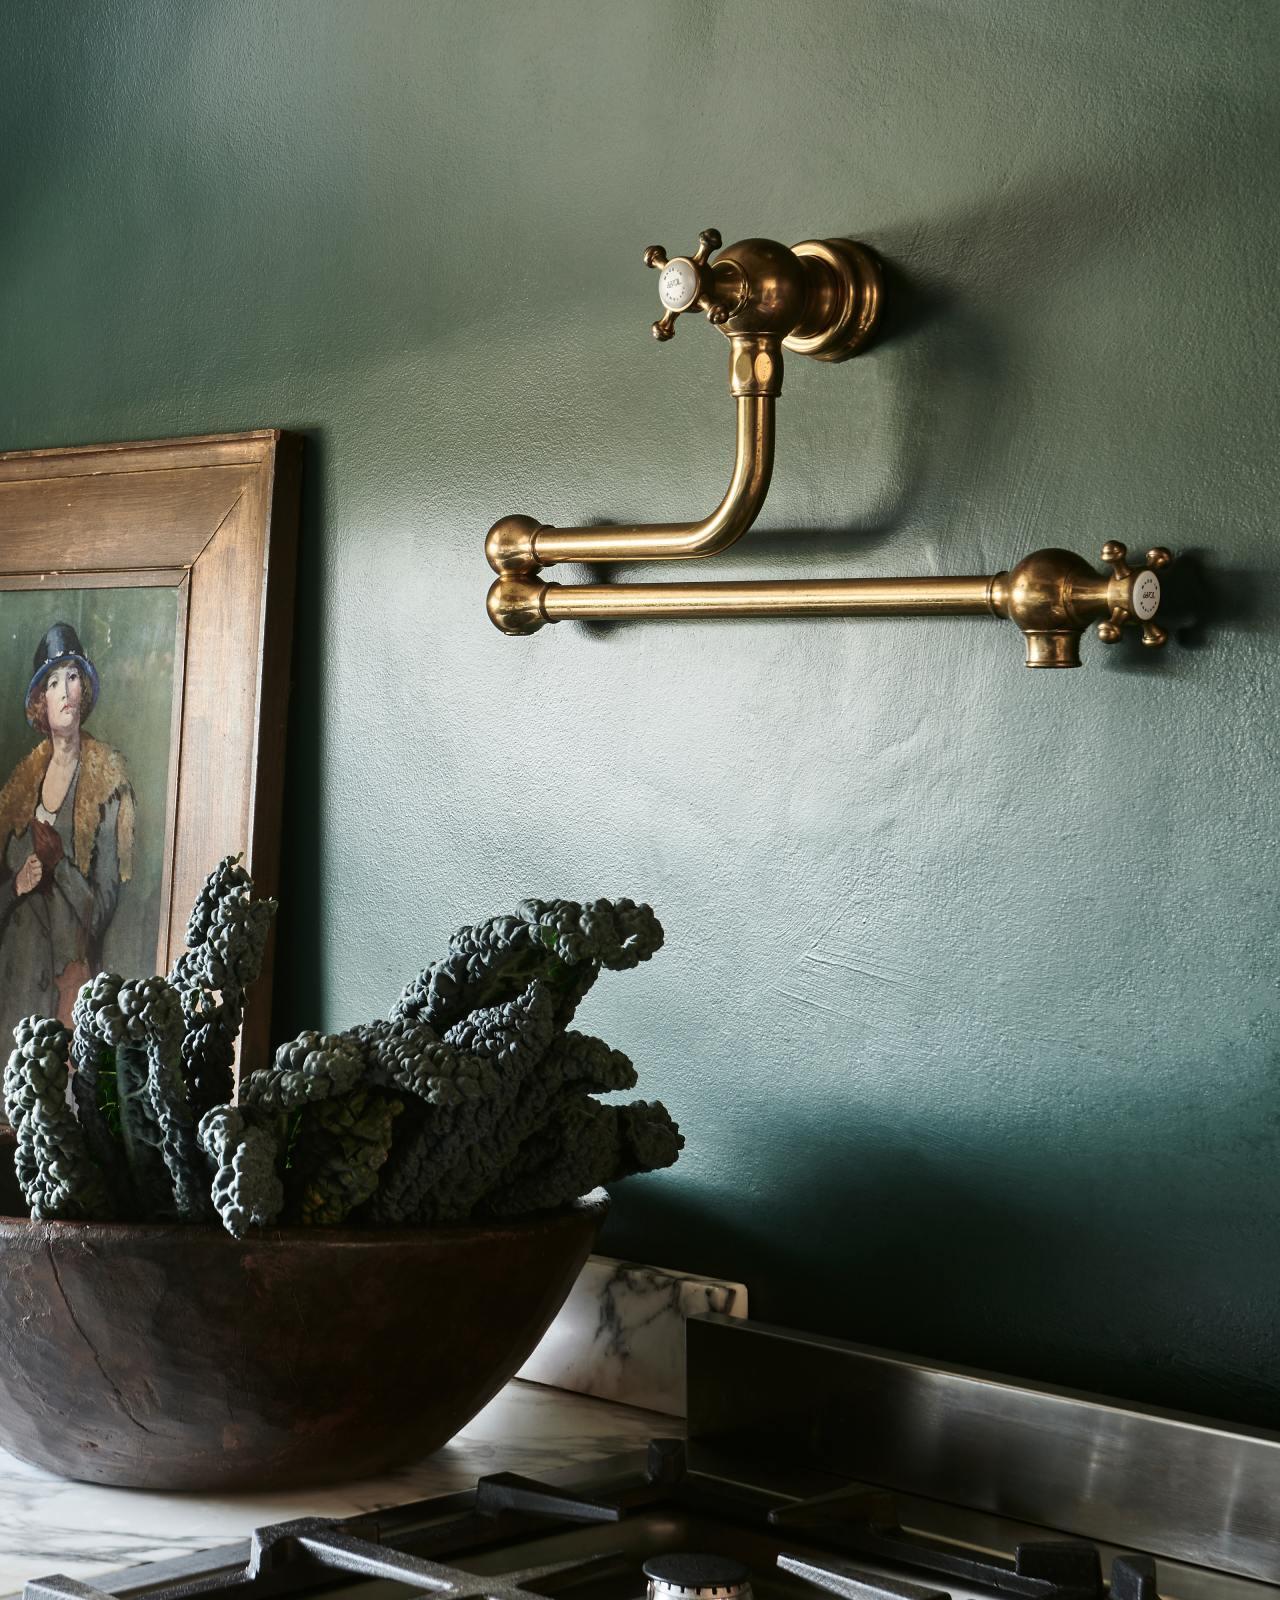 Tuscan Farmhouse 39 3/8'' Double Arabescato Marble Sink photo 3